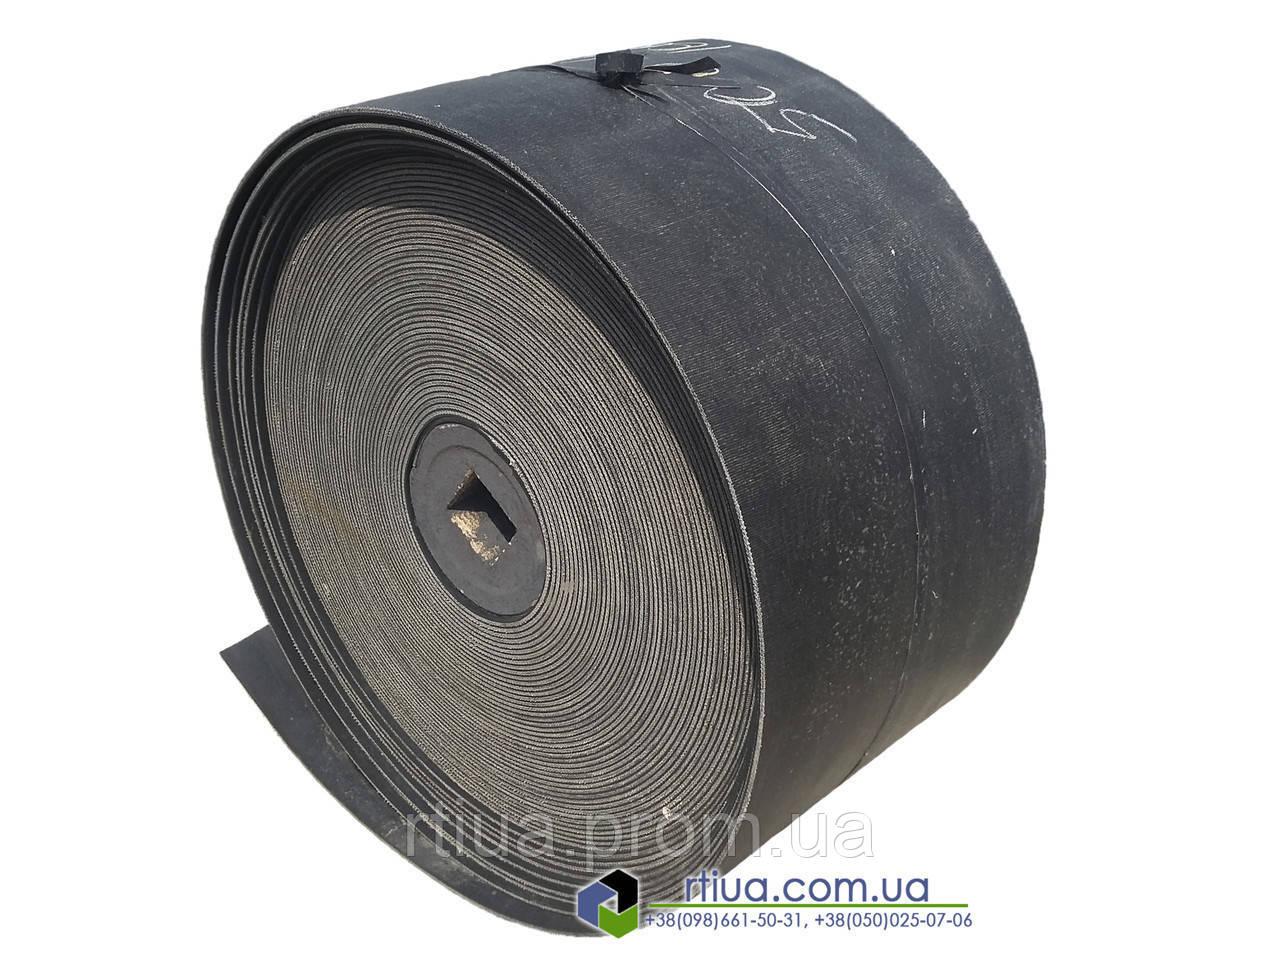 Конвейерная лента 300х2 мм